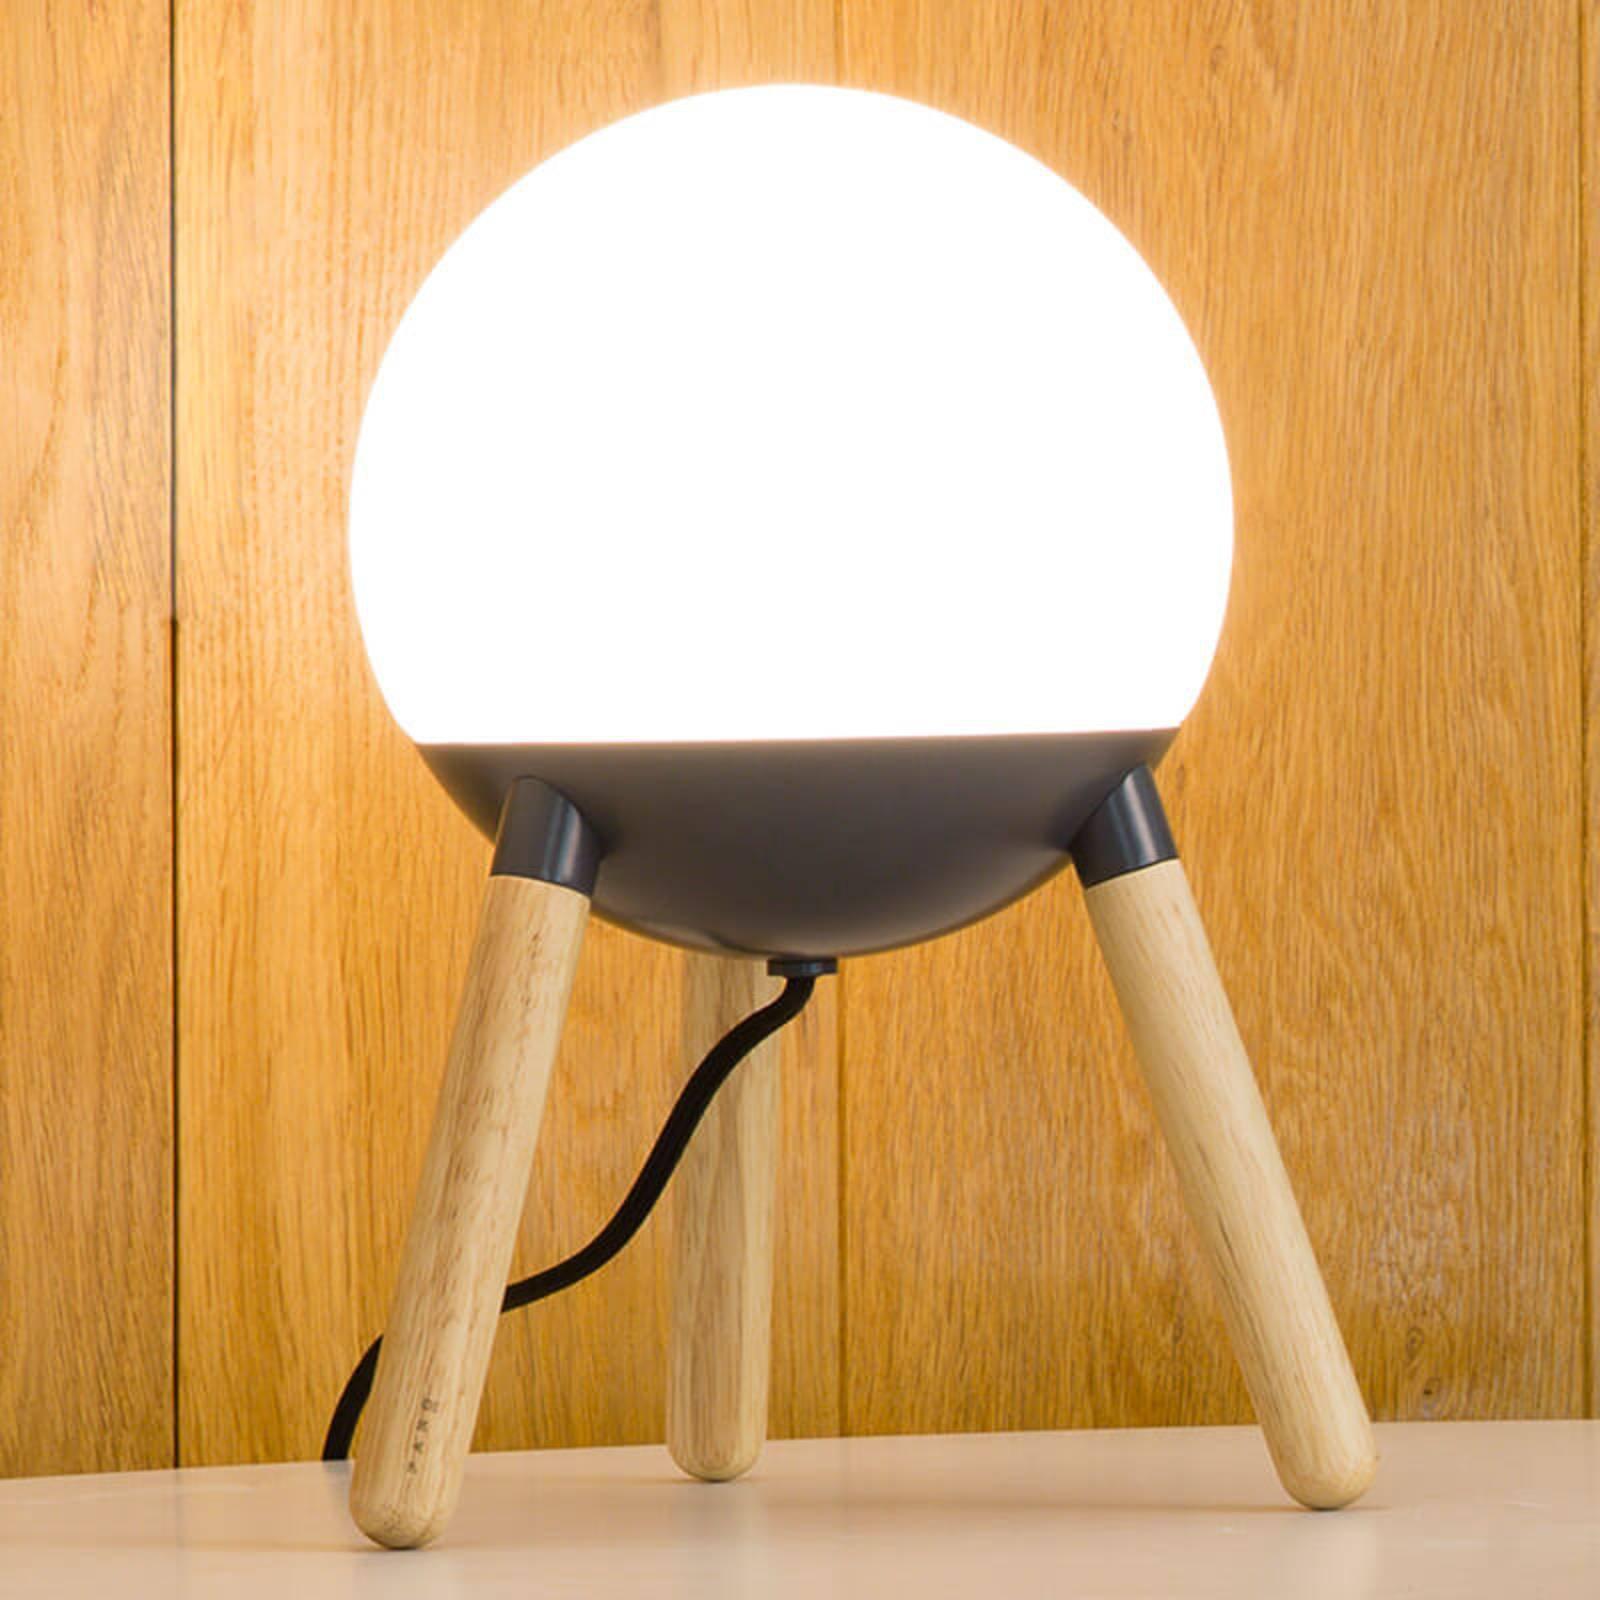 Bordlampe Mine med trebeint stamme